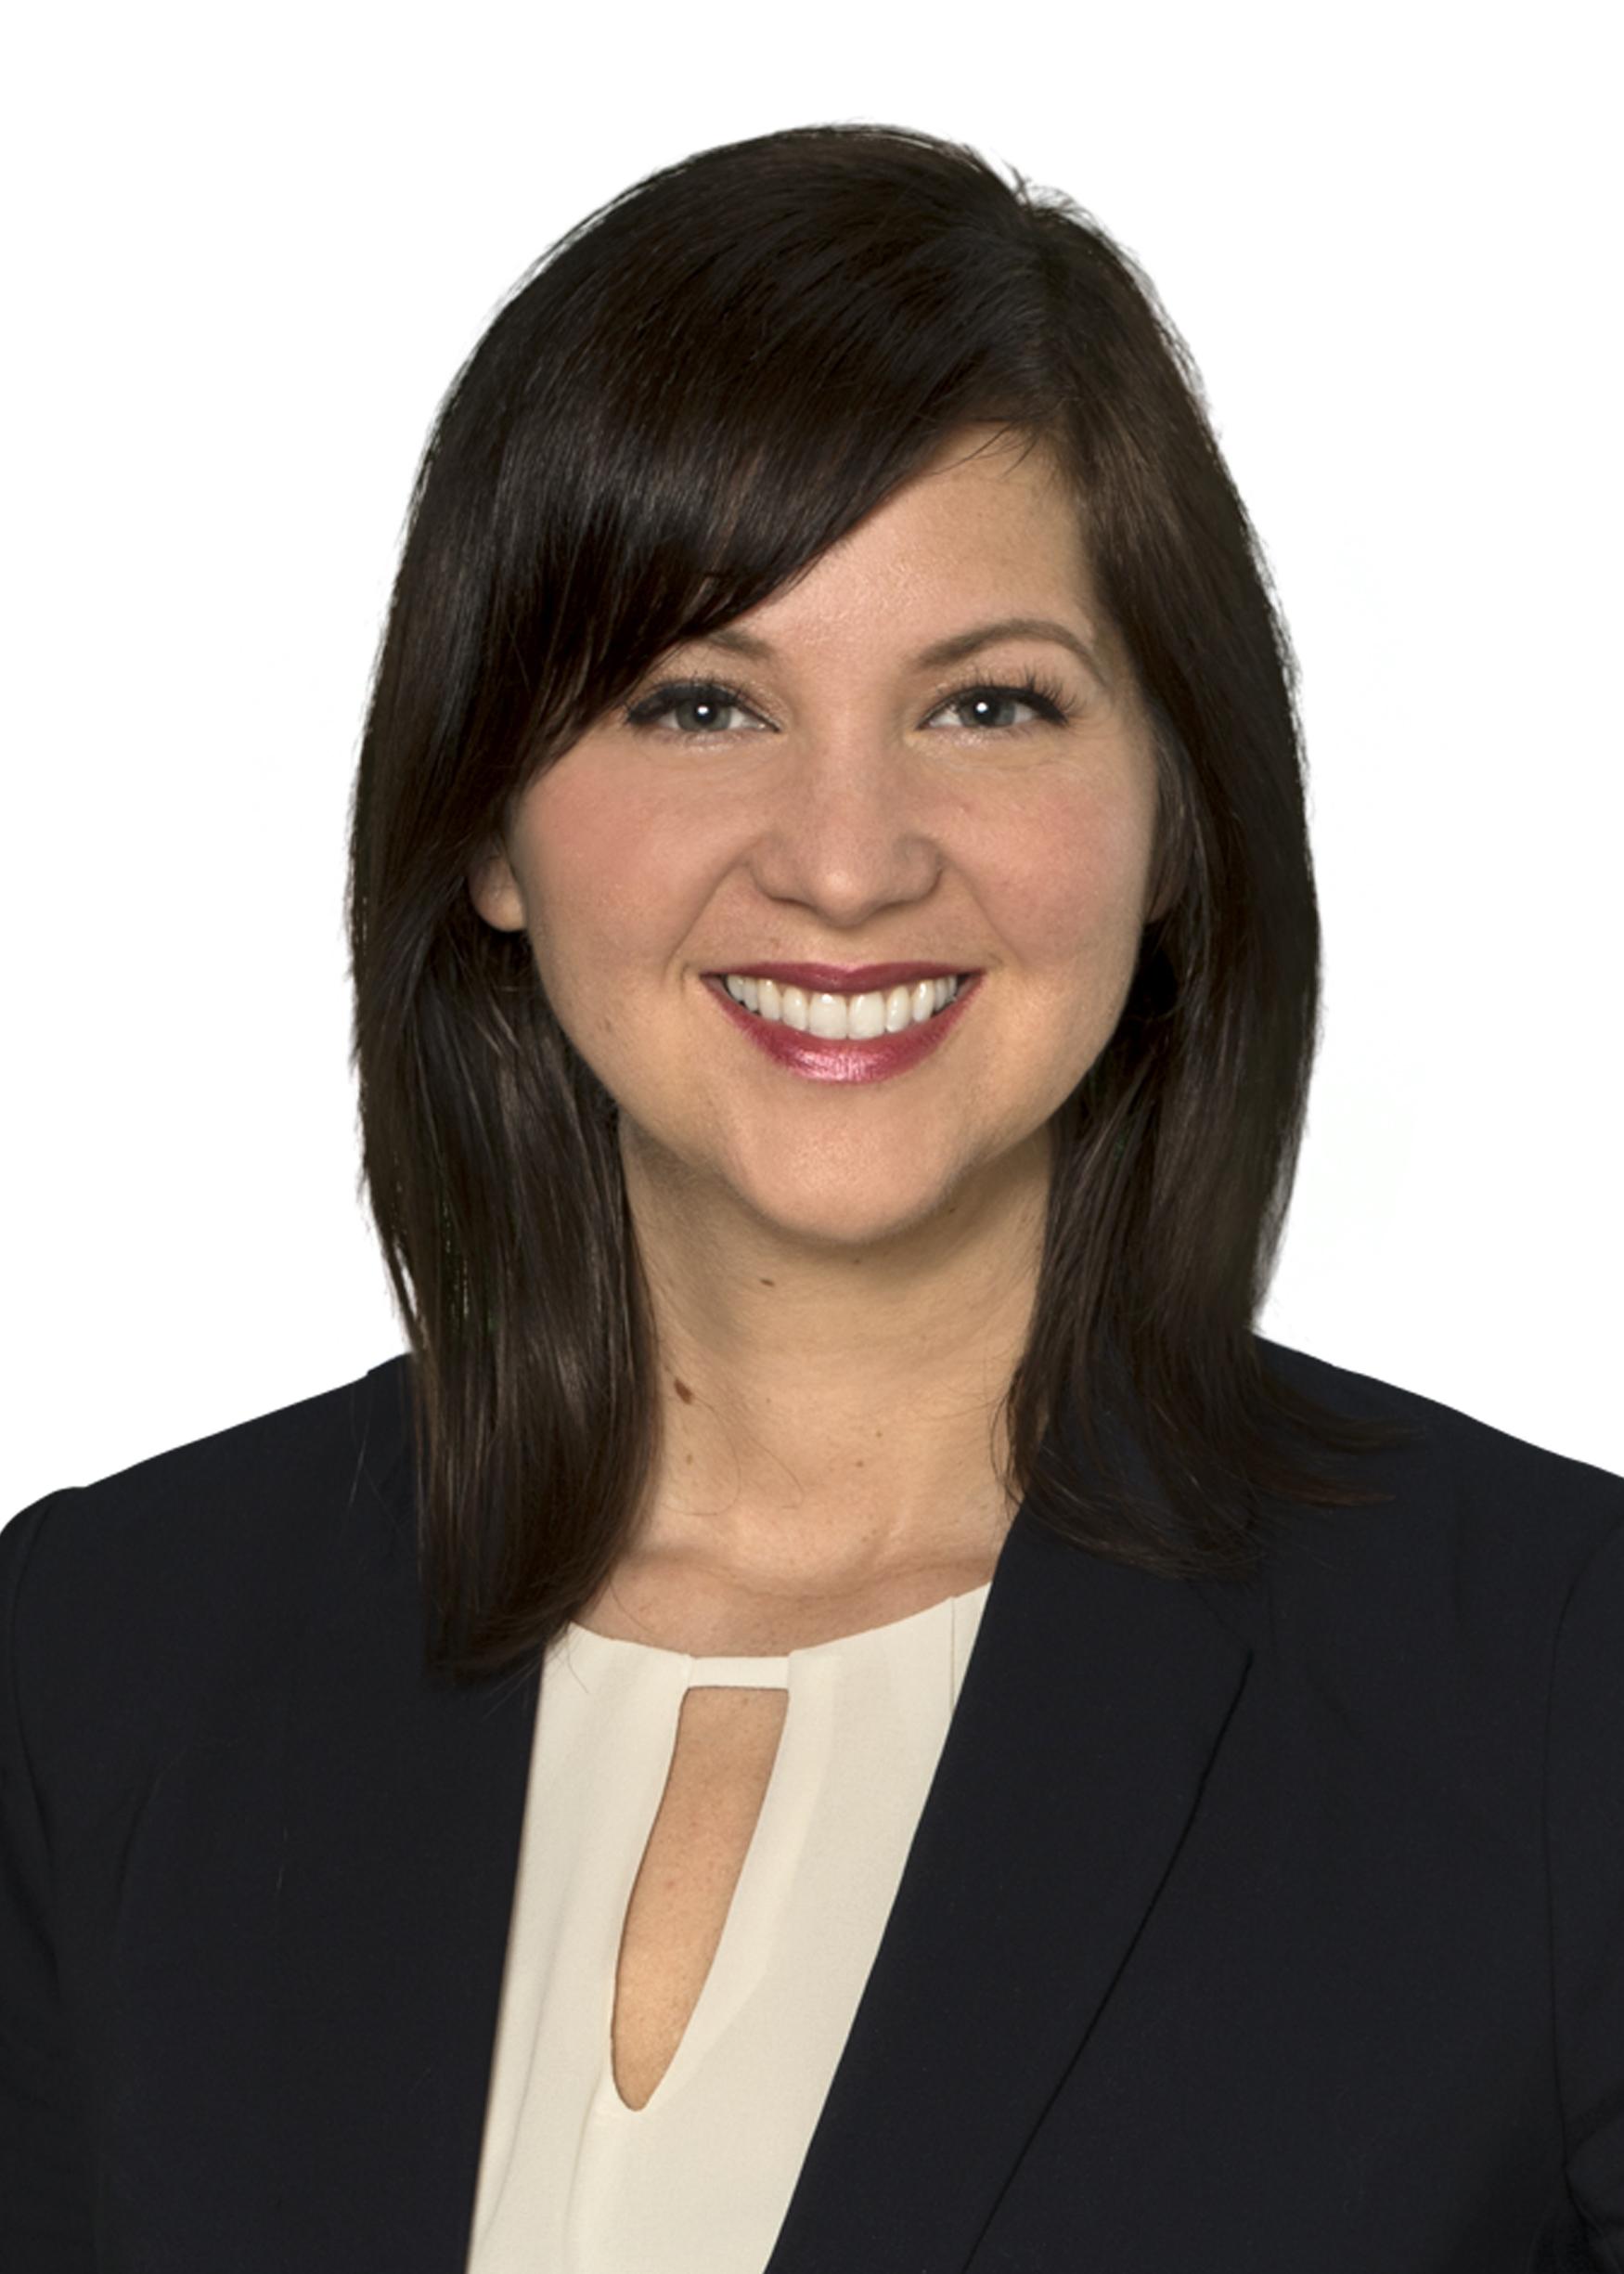 Angela Goossens